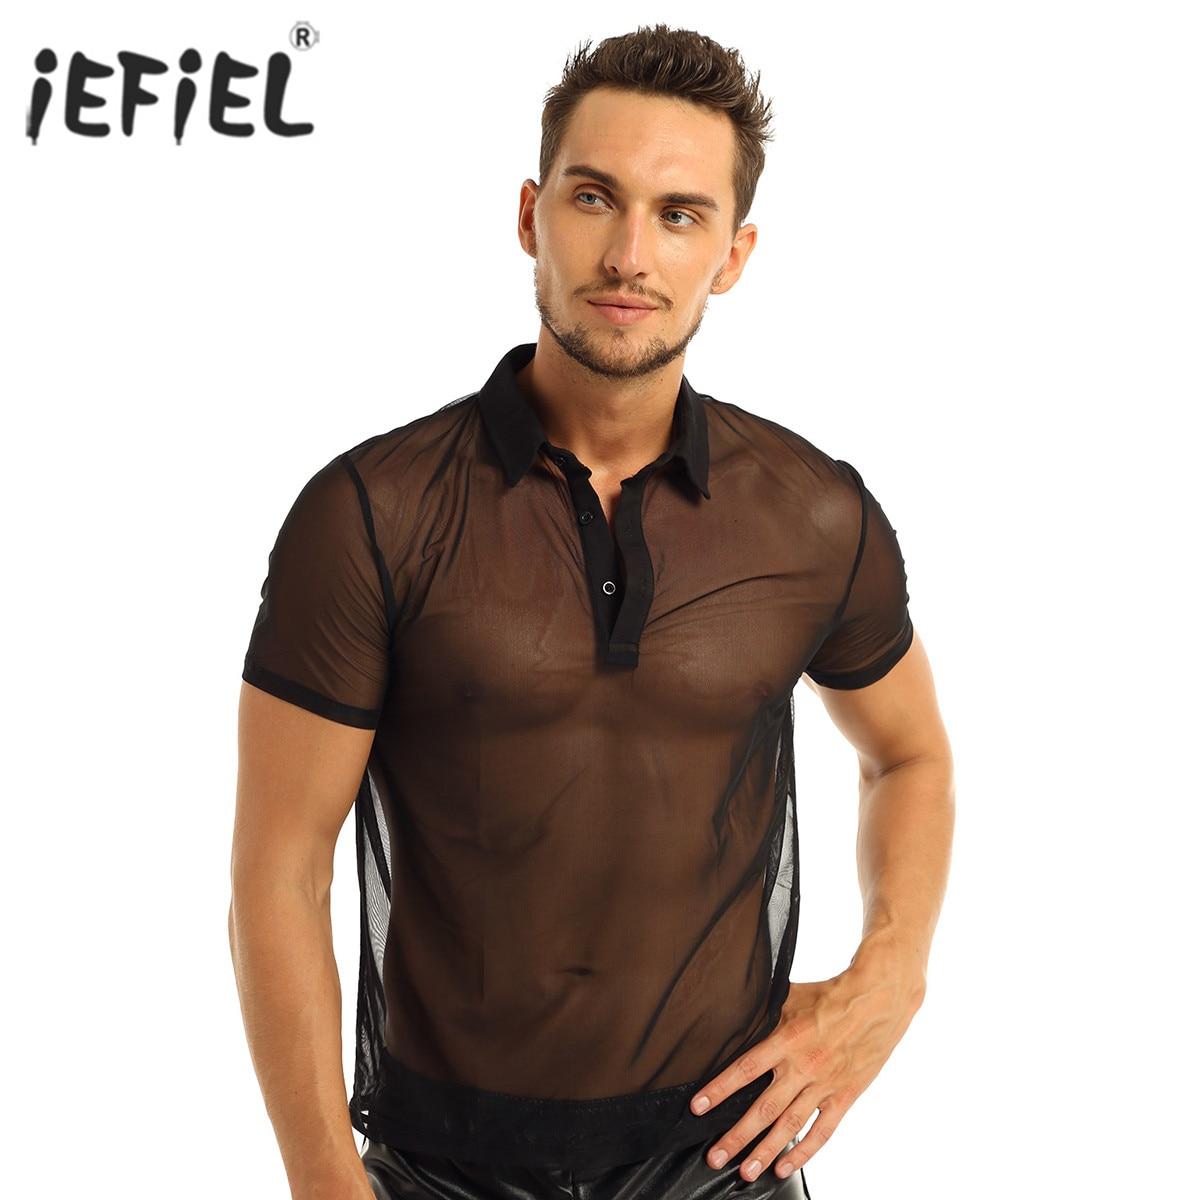 Sexy Men Undershirt See-Through Mesh T-Shirt Tops Fitness Wrestling Singlets Erotic Short Sleeves Turn-down Collar Men Vests